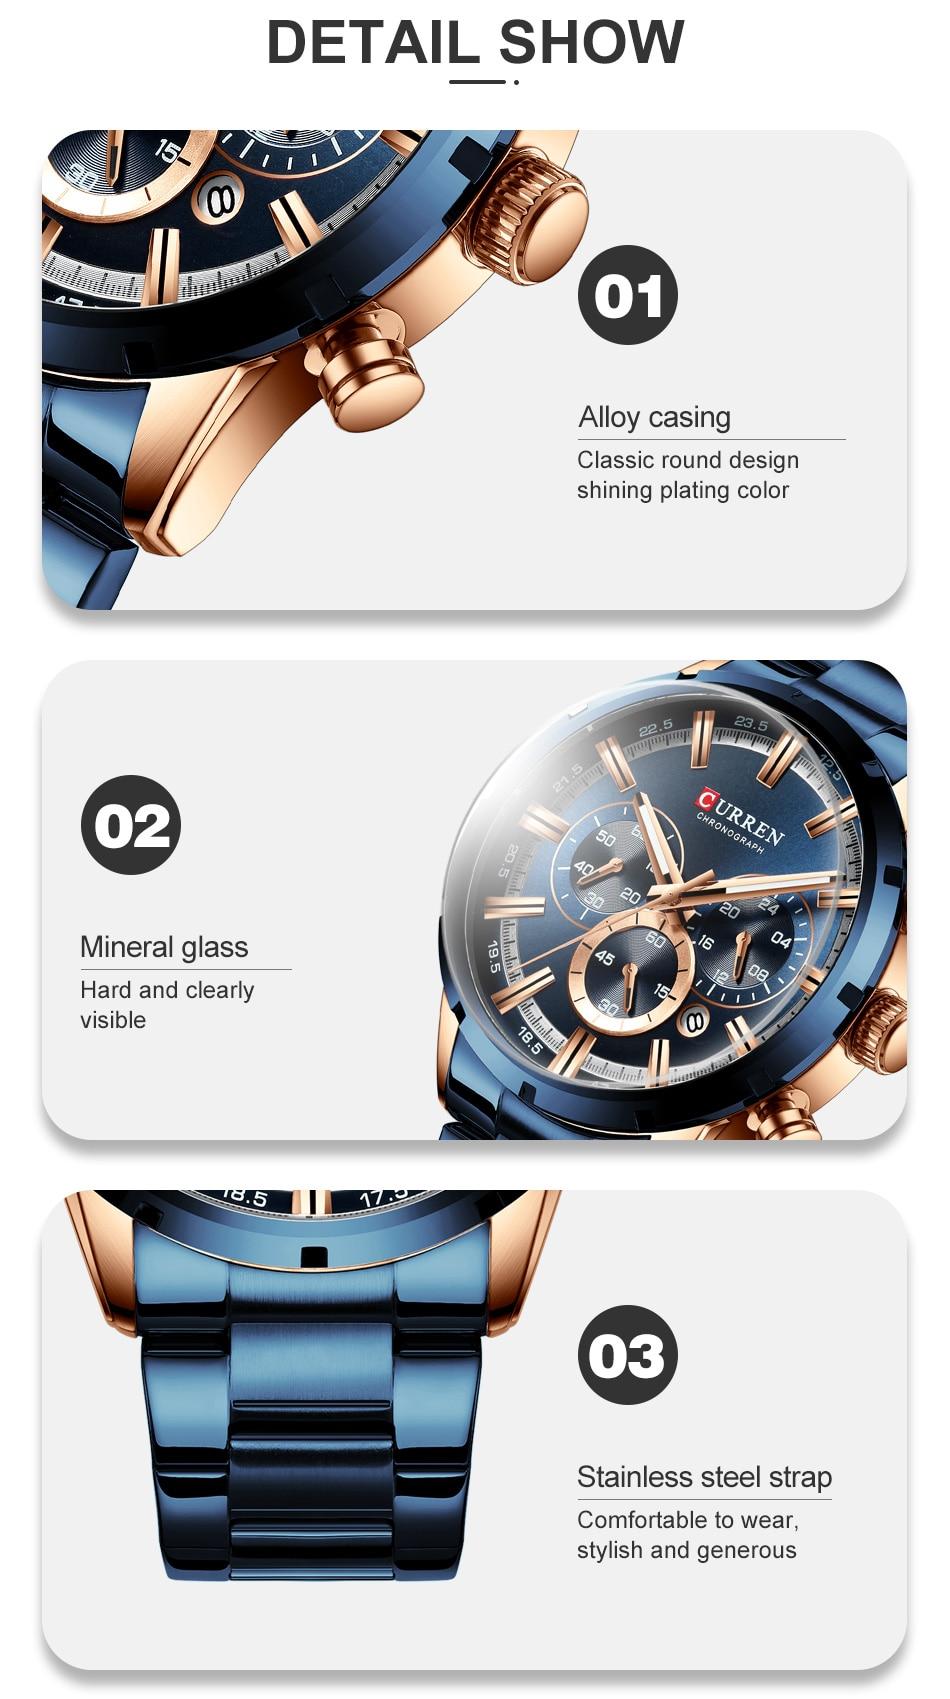 H5045dc361cd24d829f2a2dbfd49dda2ad CURREN Men Watch Top Brand Luxury Sports Quartz Mens Watches Full Steel Waterproof Chronograph Wristwatch Men Relogio Masculino